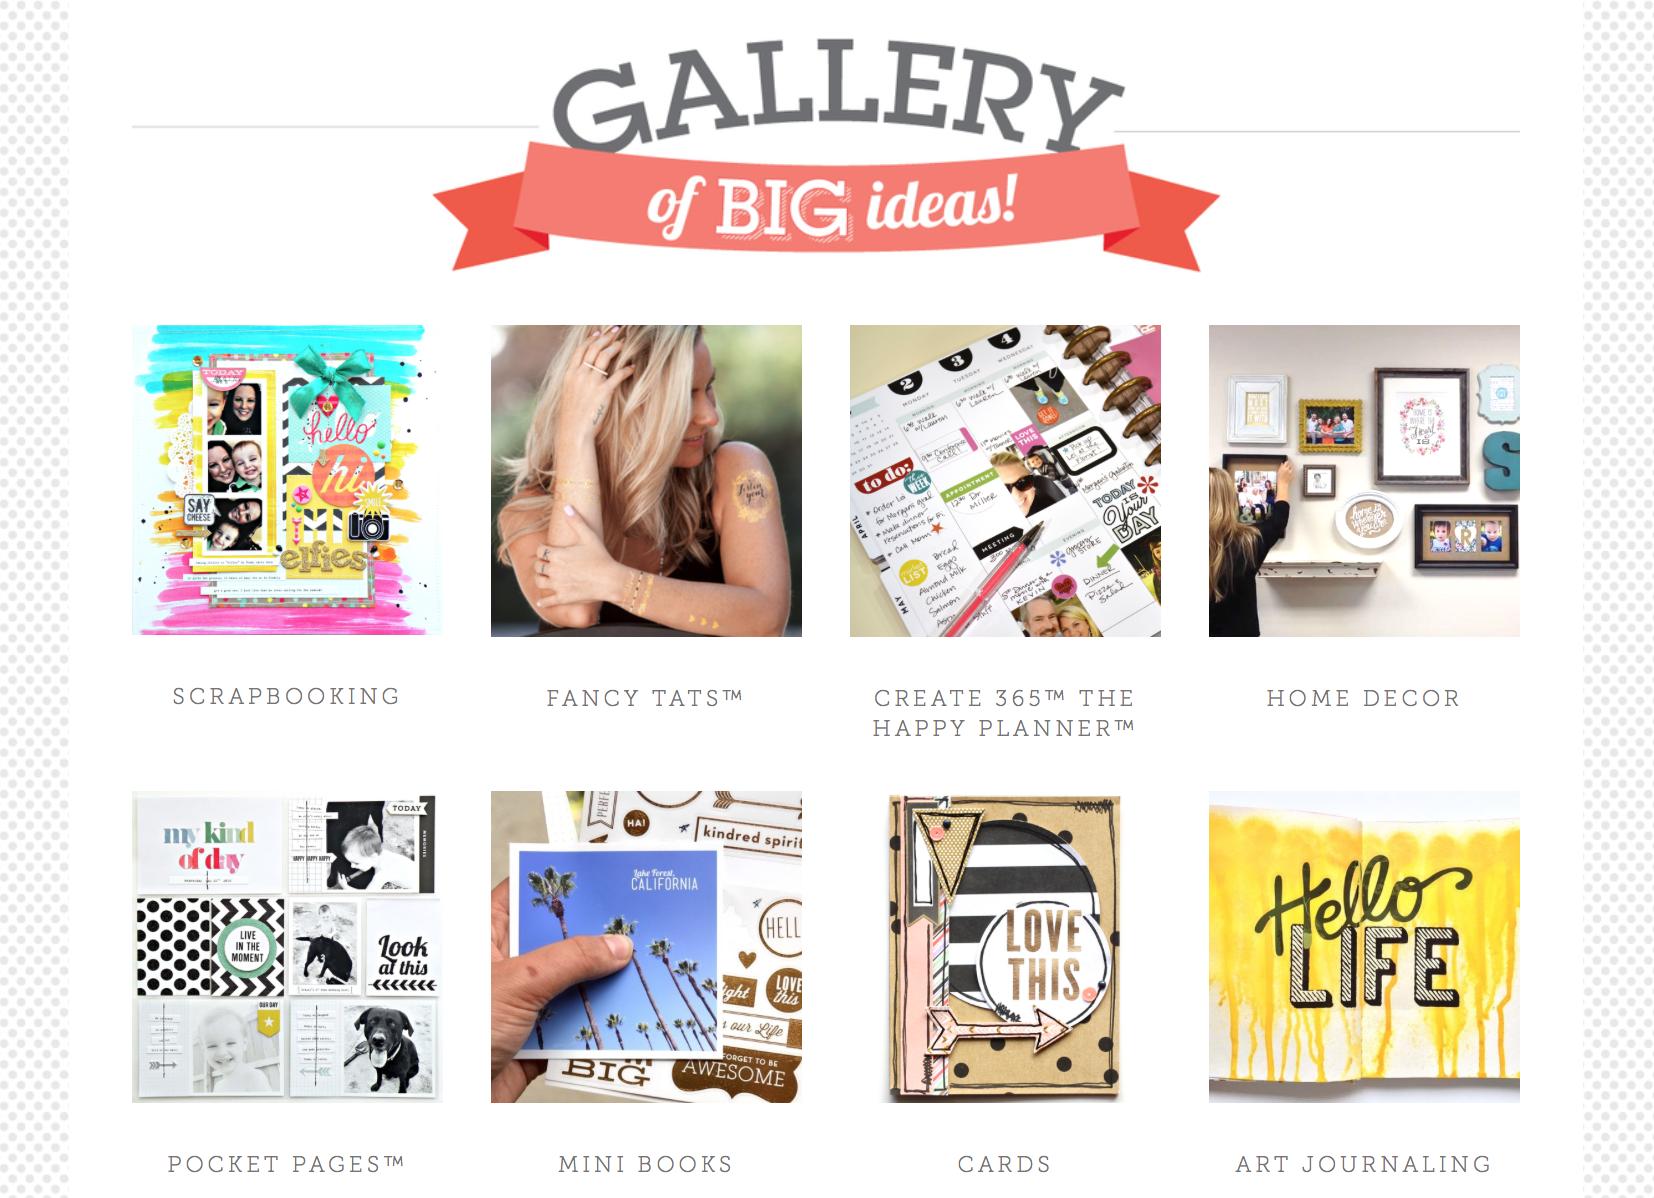 mambi website's new GALLERY of BIG IDEAS | me & my BIG ideas